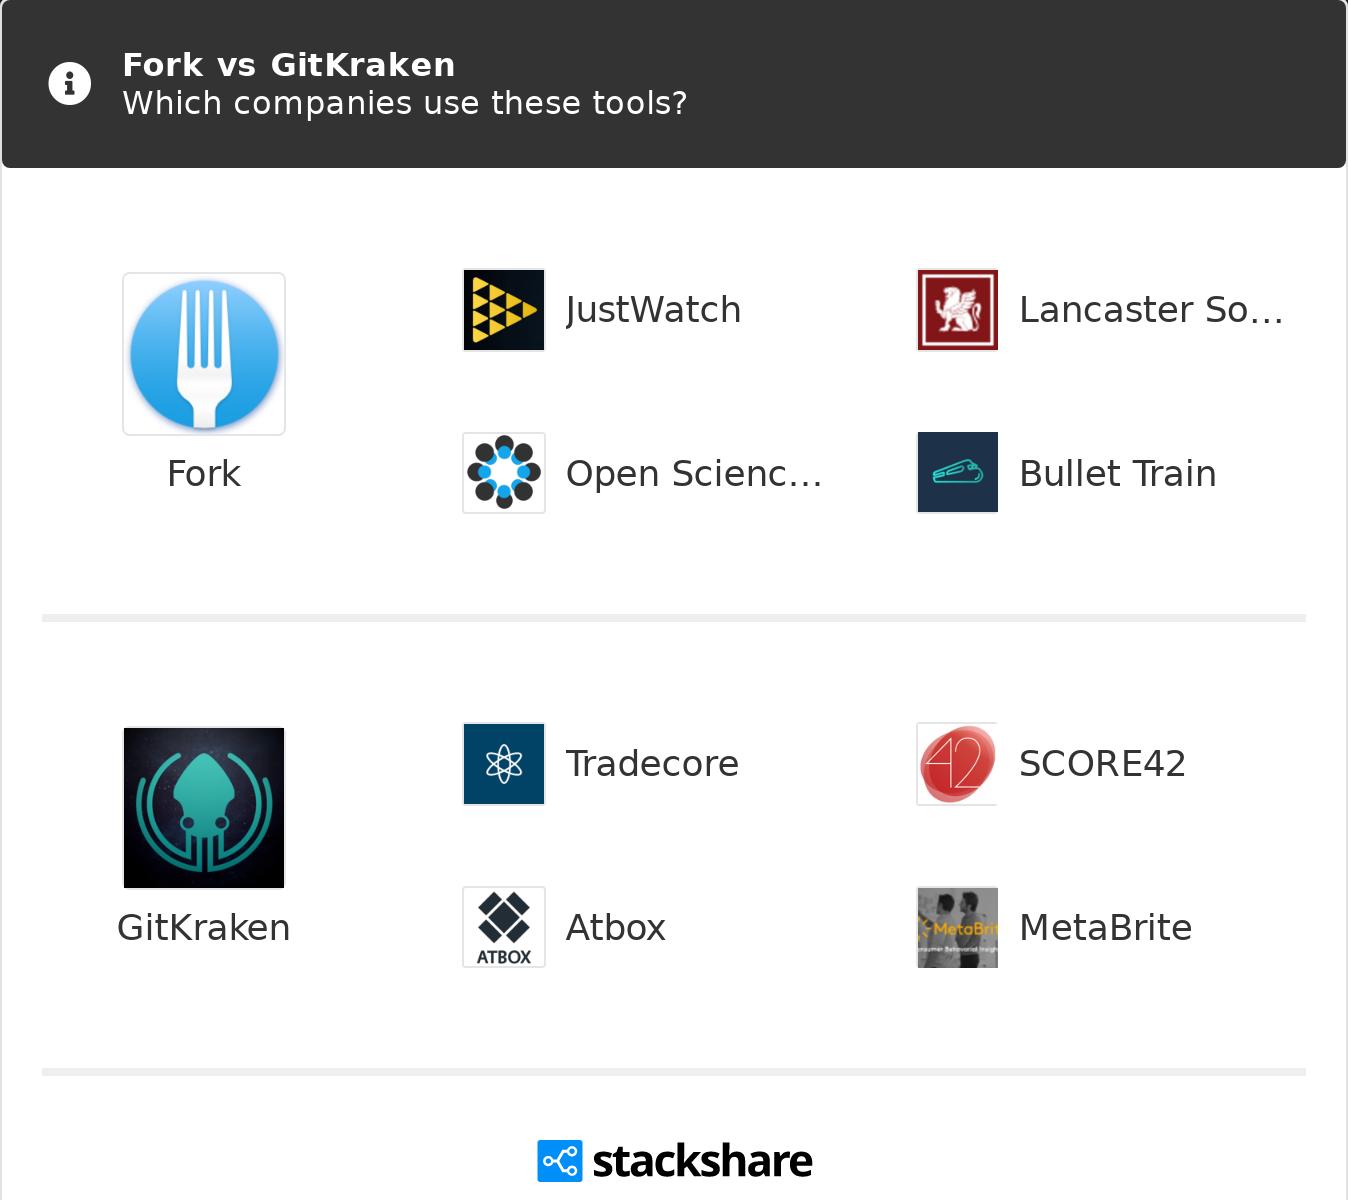 Fork vs GitKraken | What are the differences?